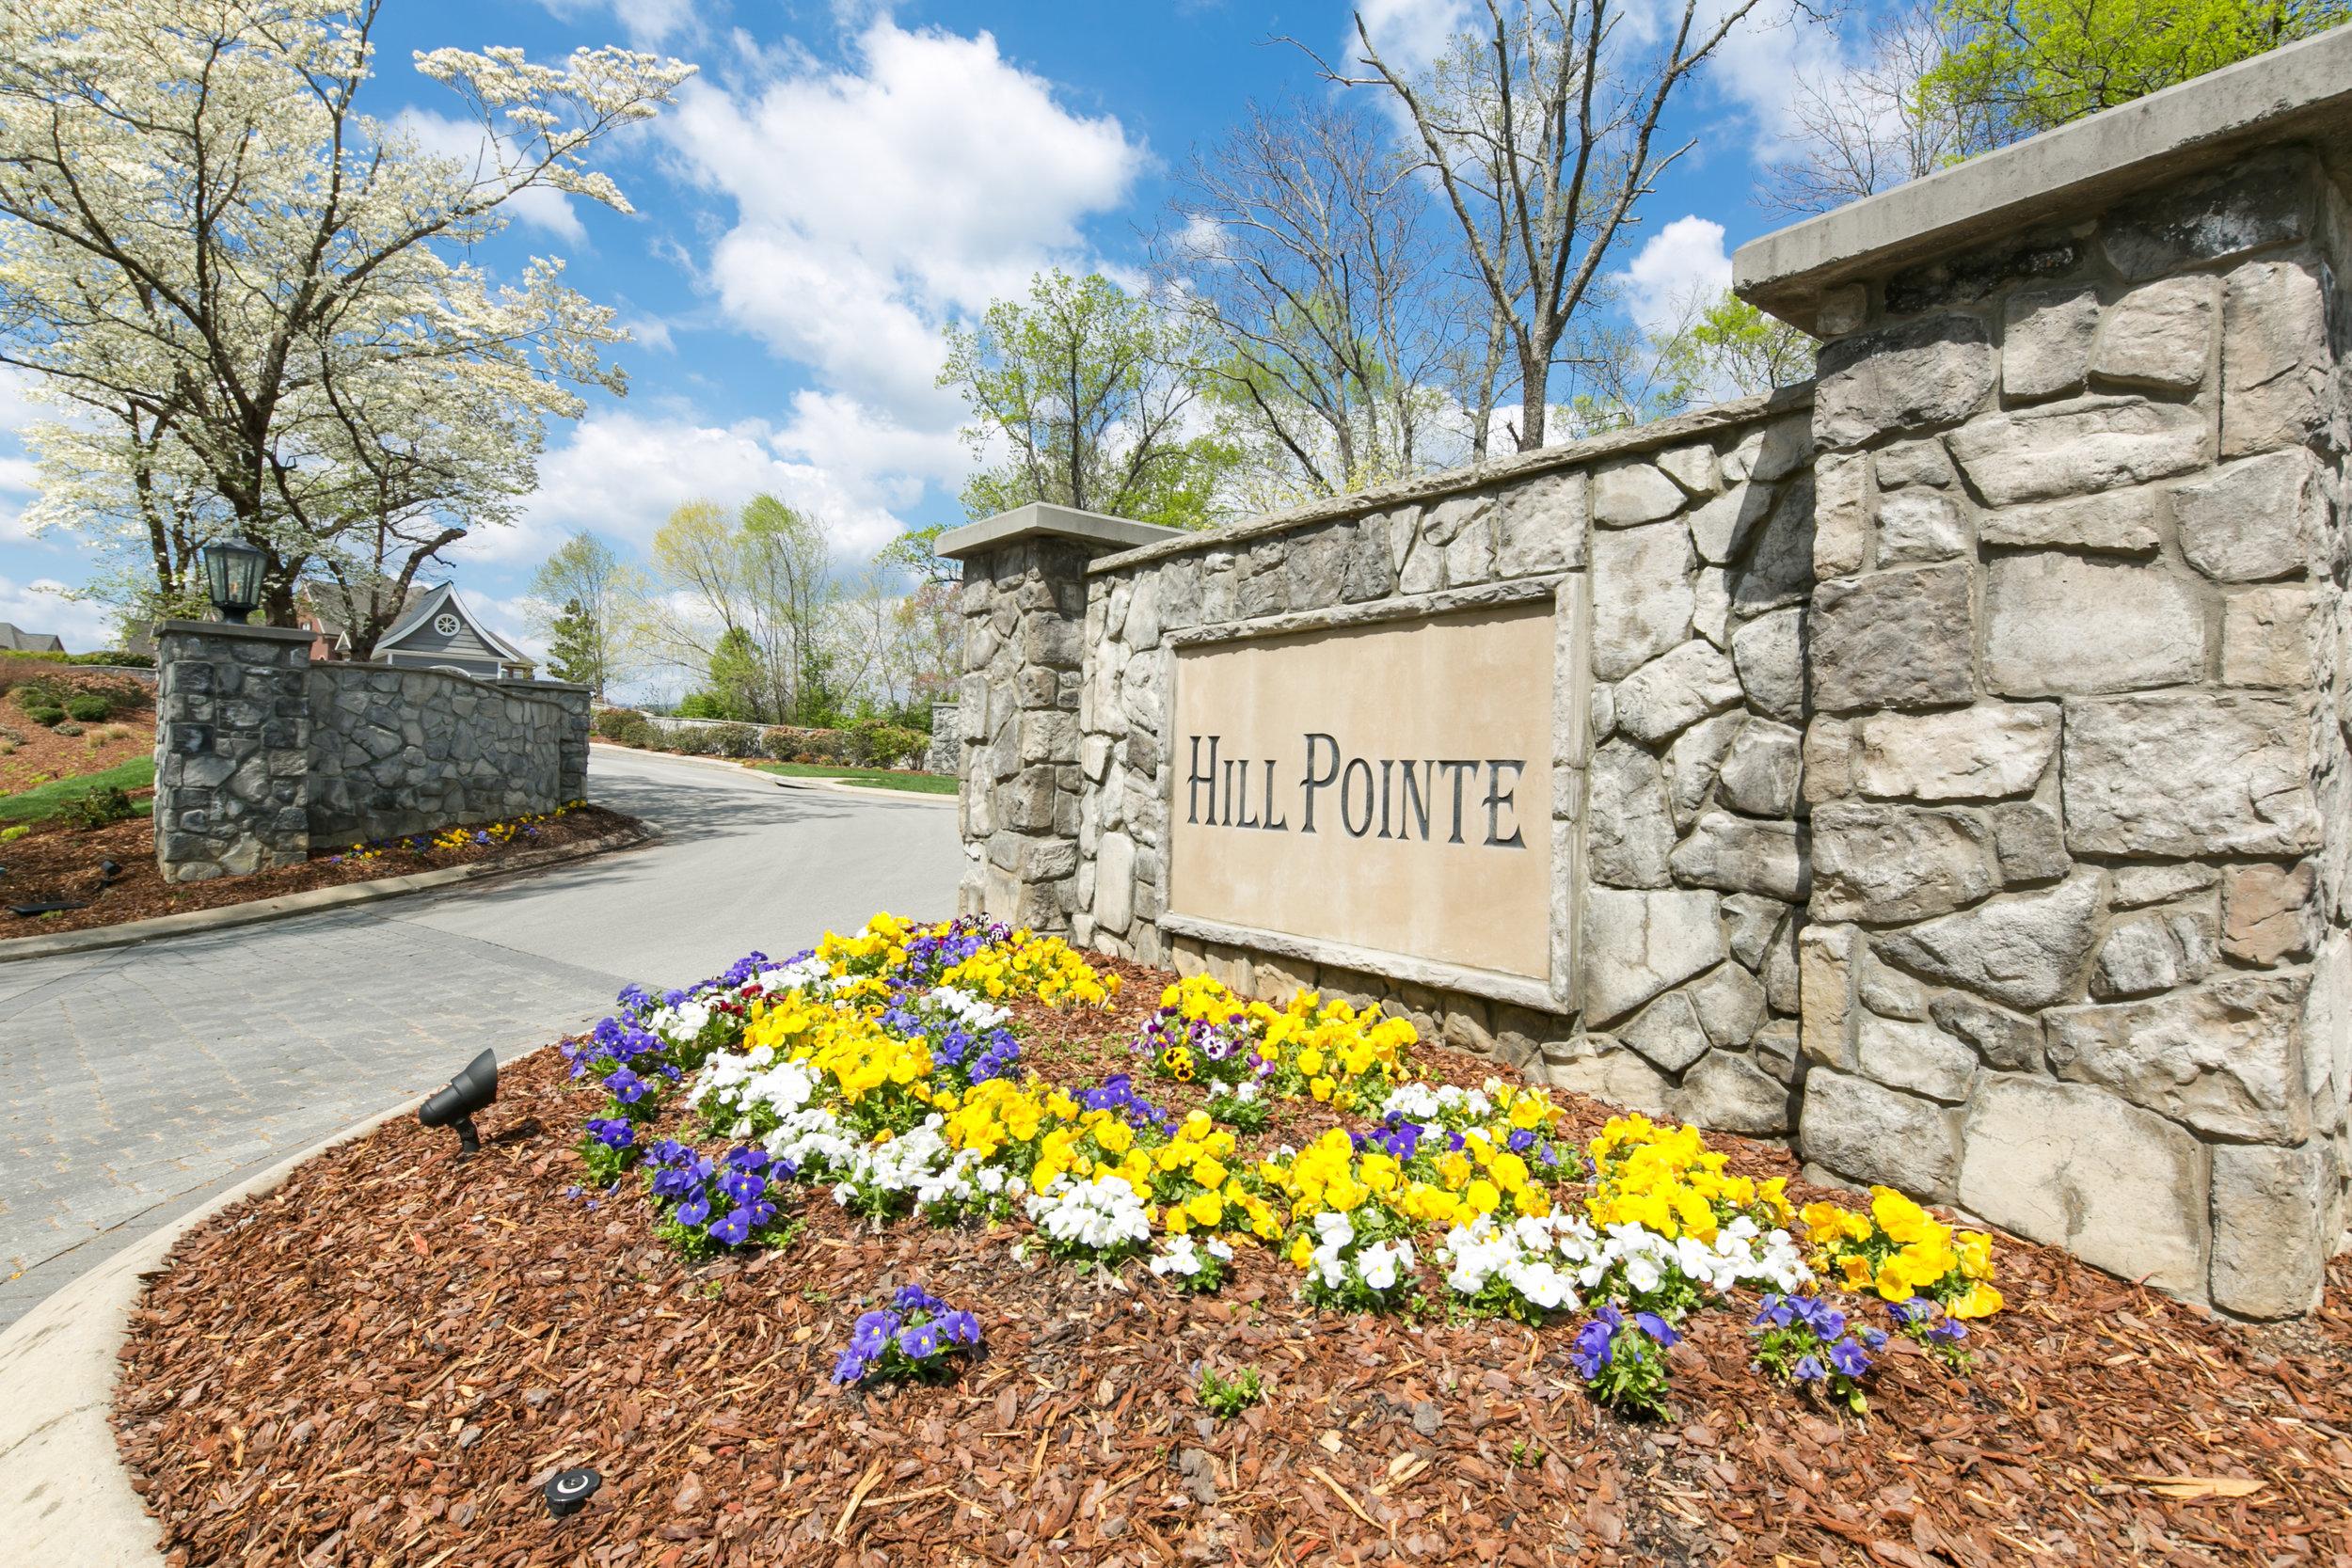 Hill Pointe 005.jpg